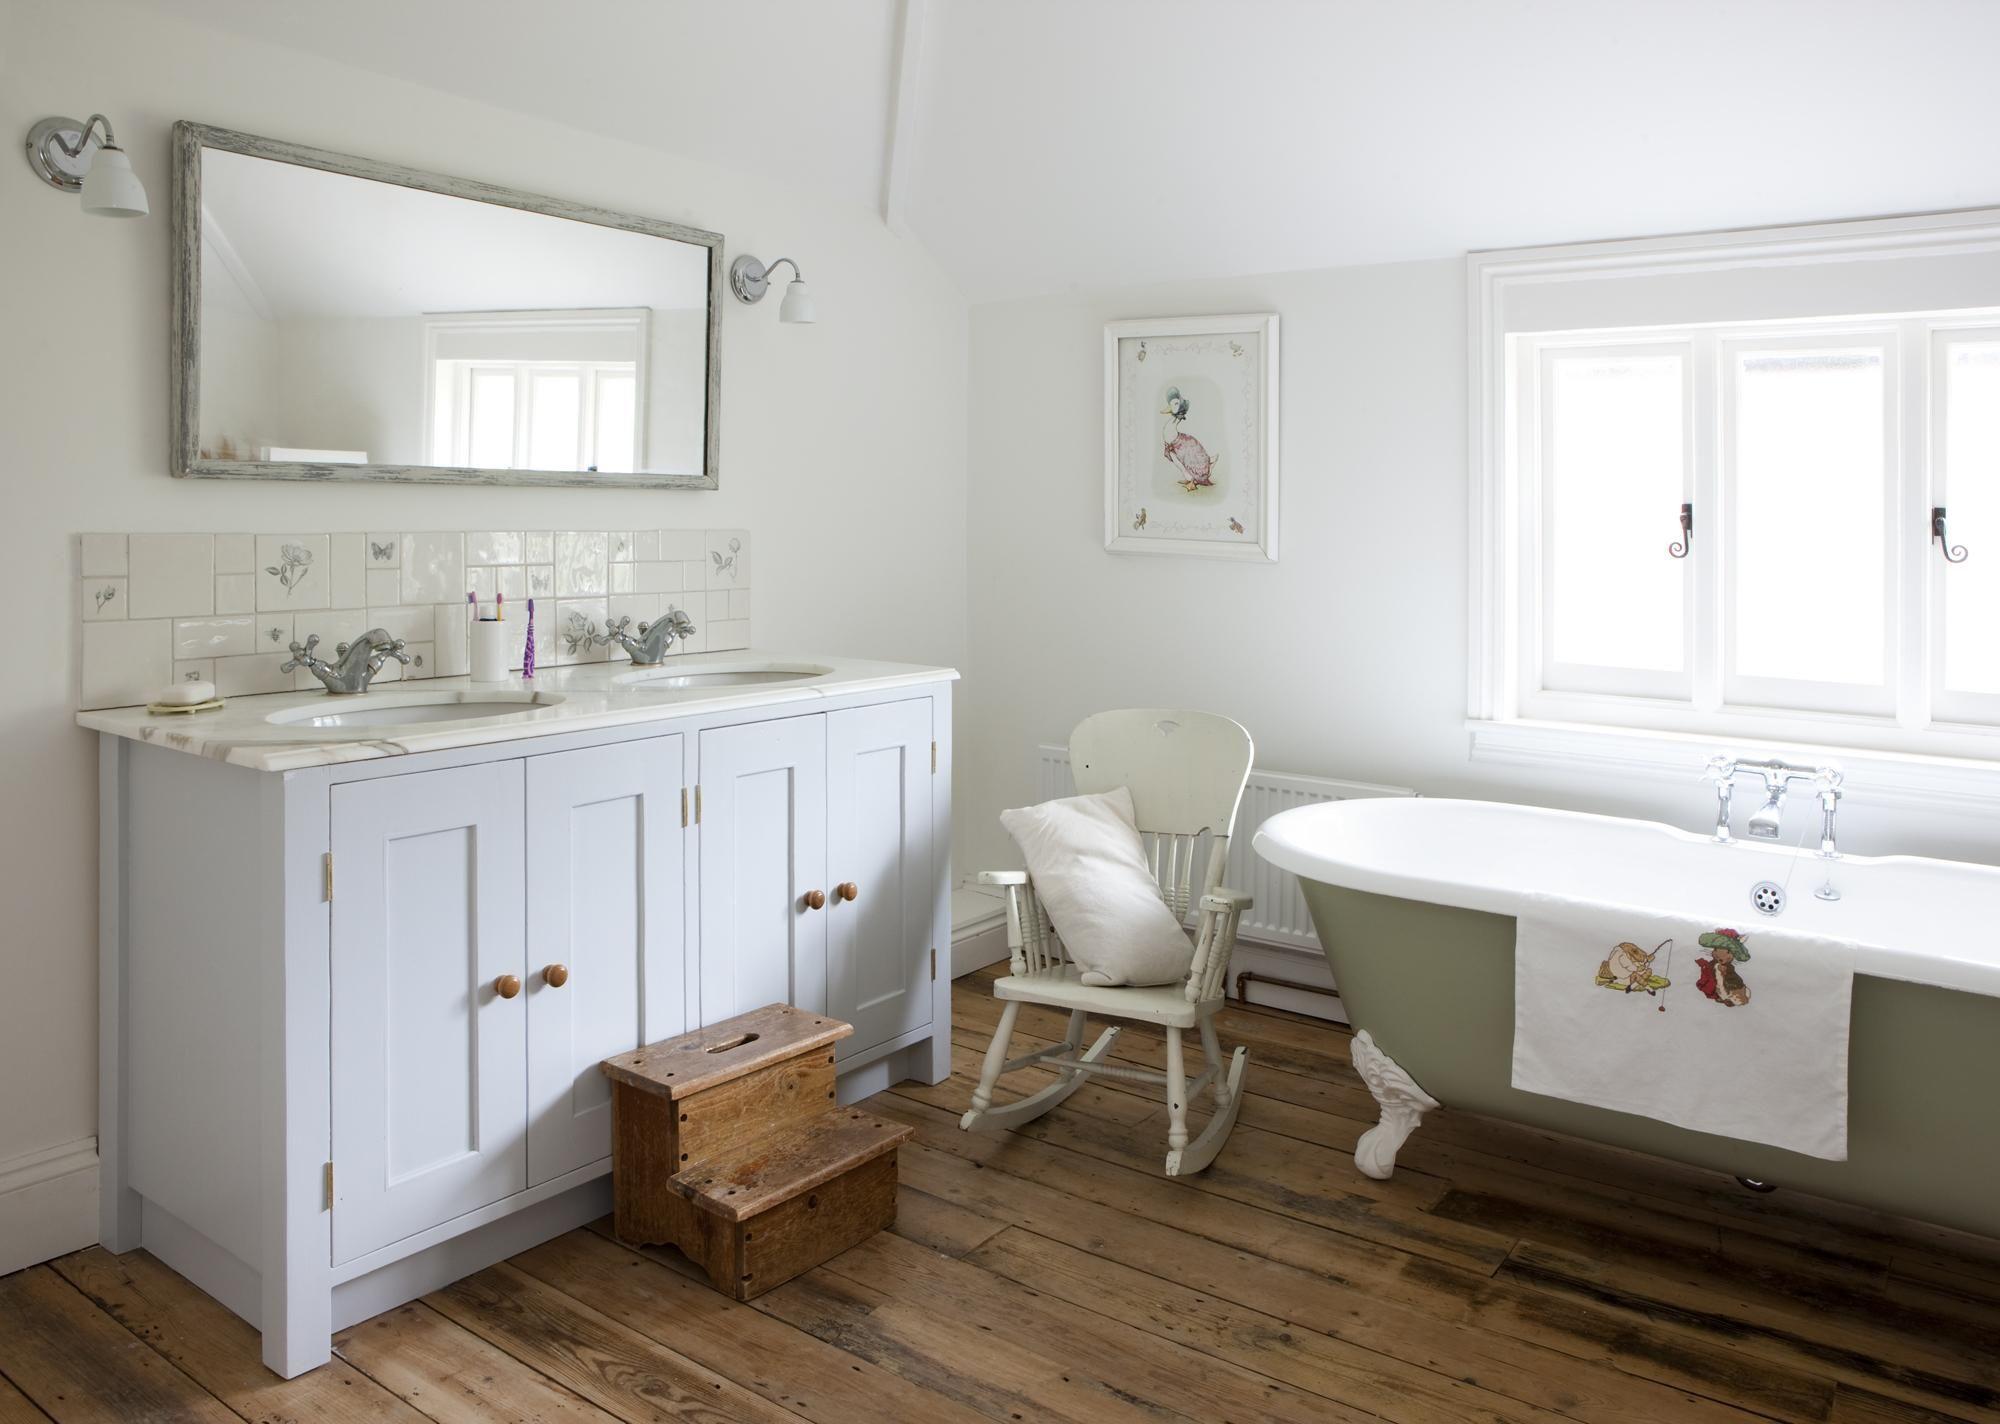 Bespoke Bathroom Vanity with marble top and roll top bath | B ...